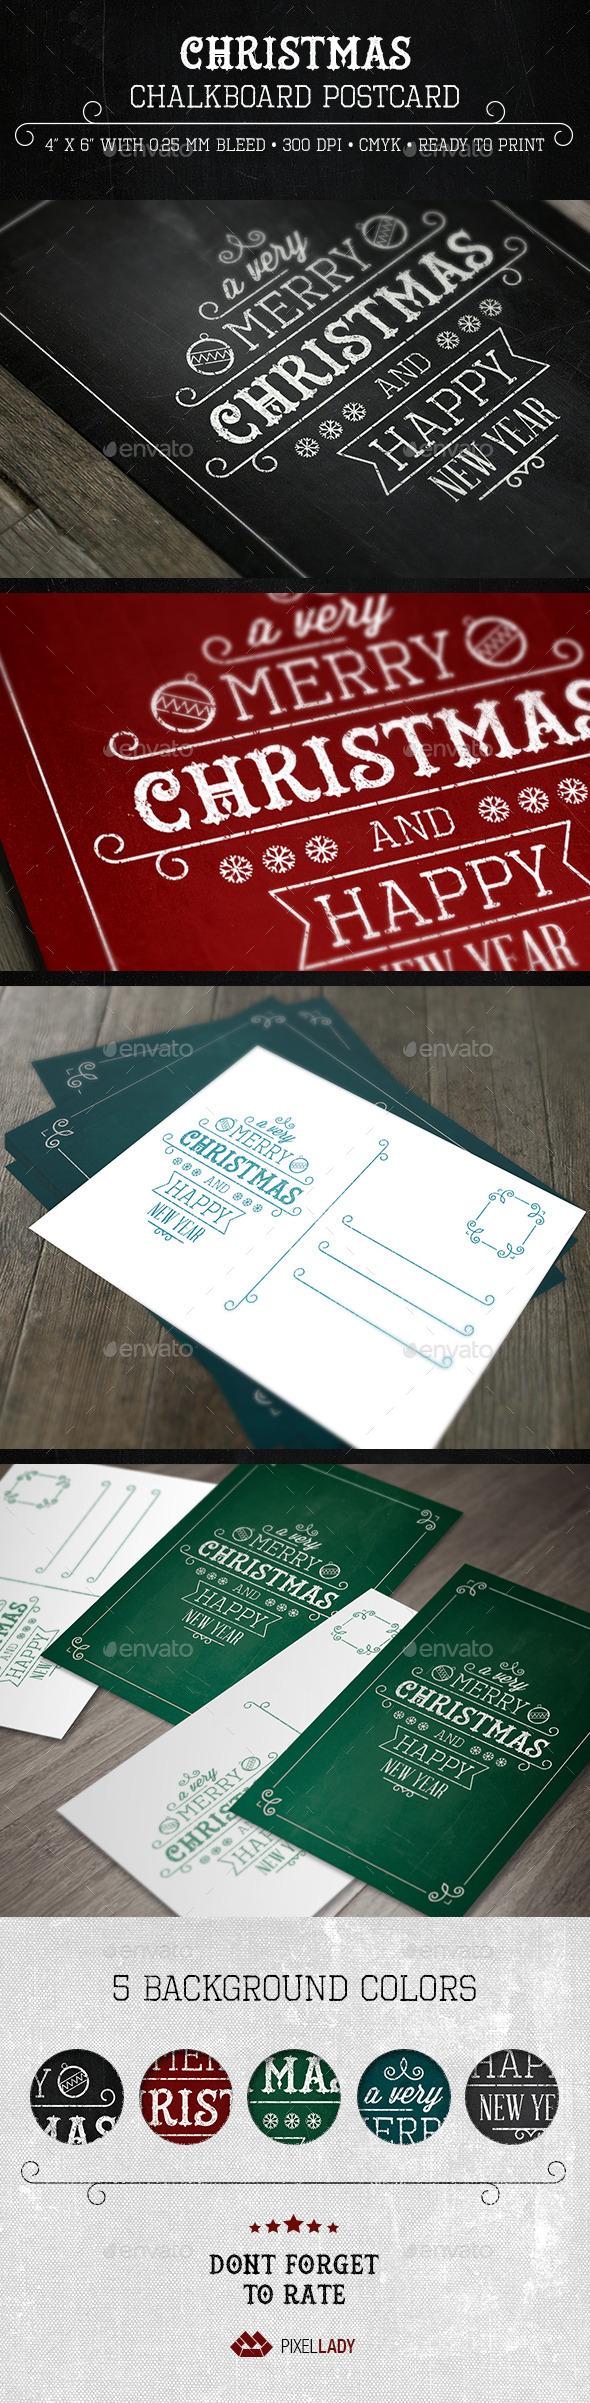 Christmas Chalkboard Postcard - Cards & Invites Print Templates